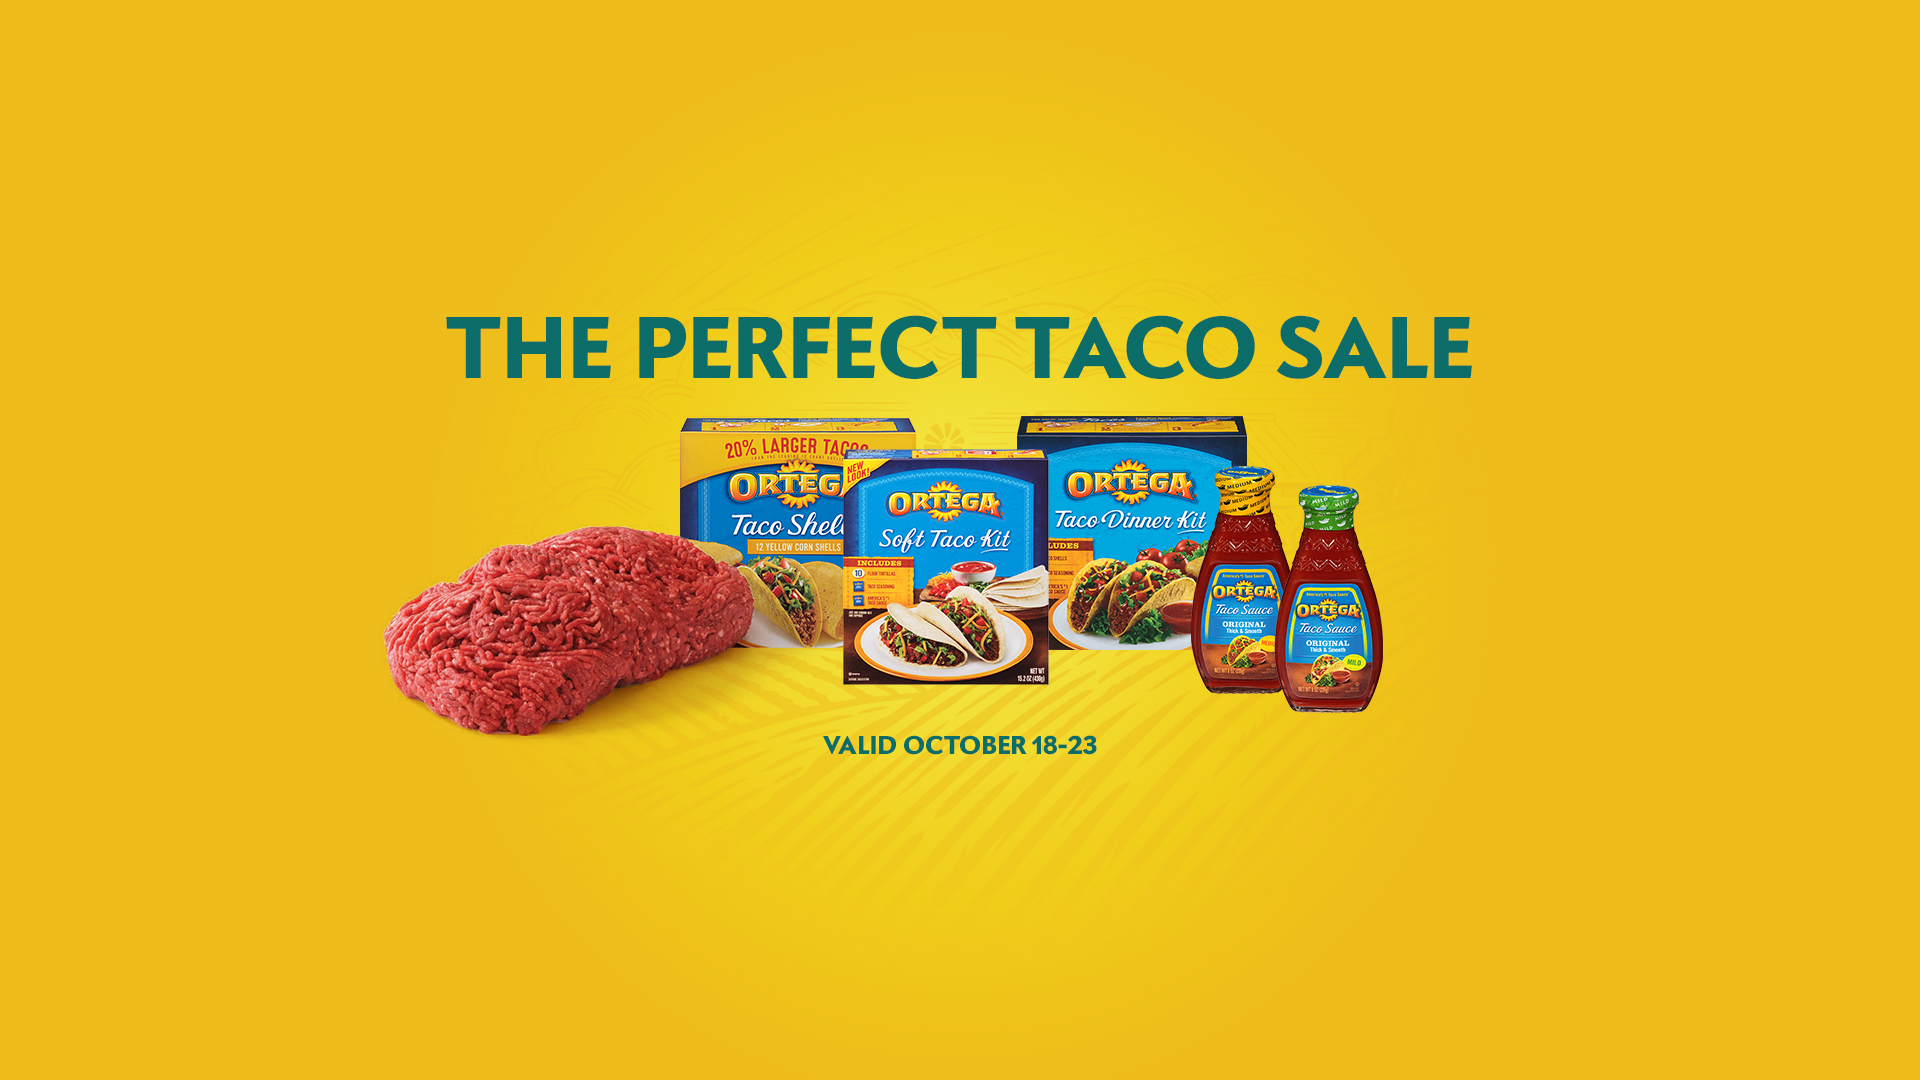 TACO-BEEF-ORTEGA-sale-web.jpg